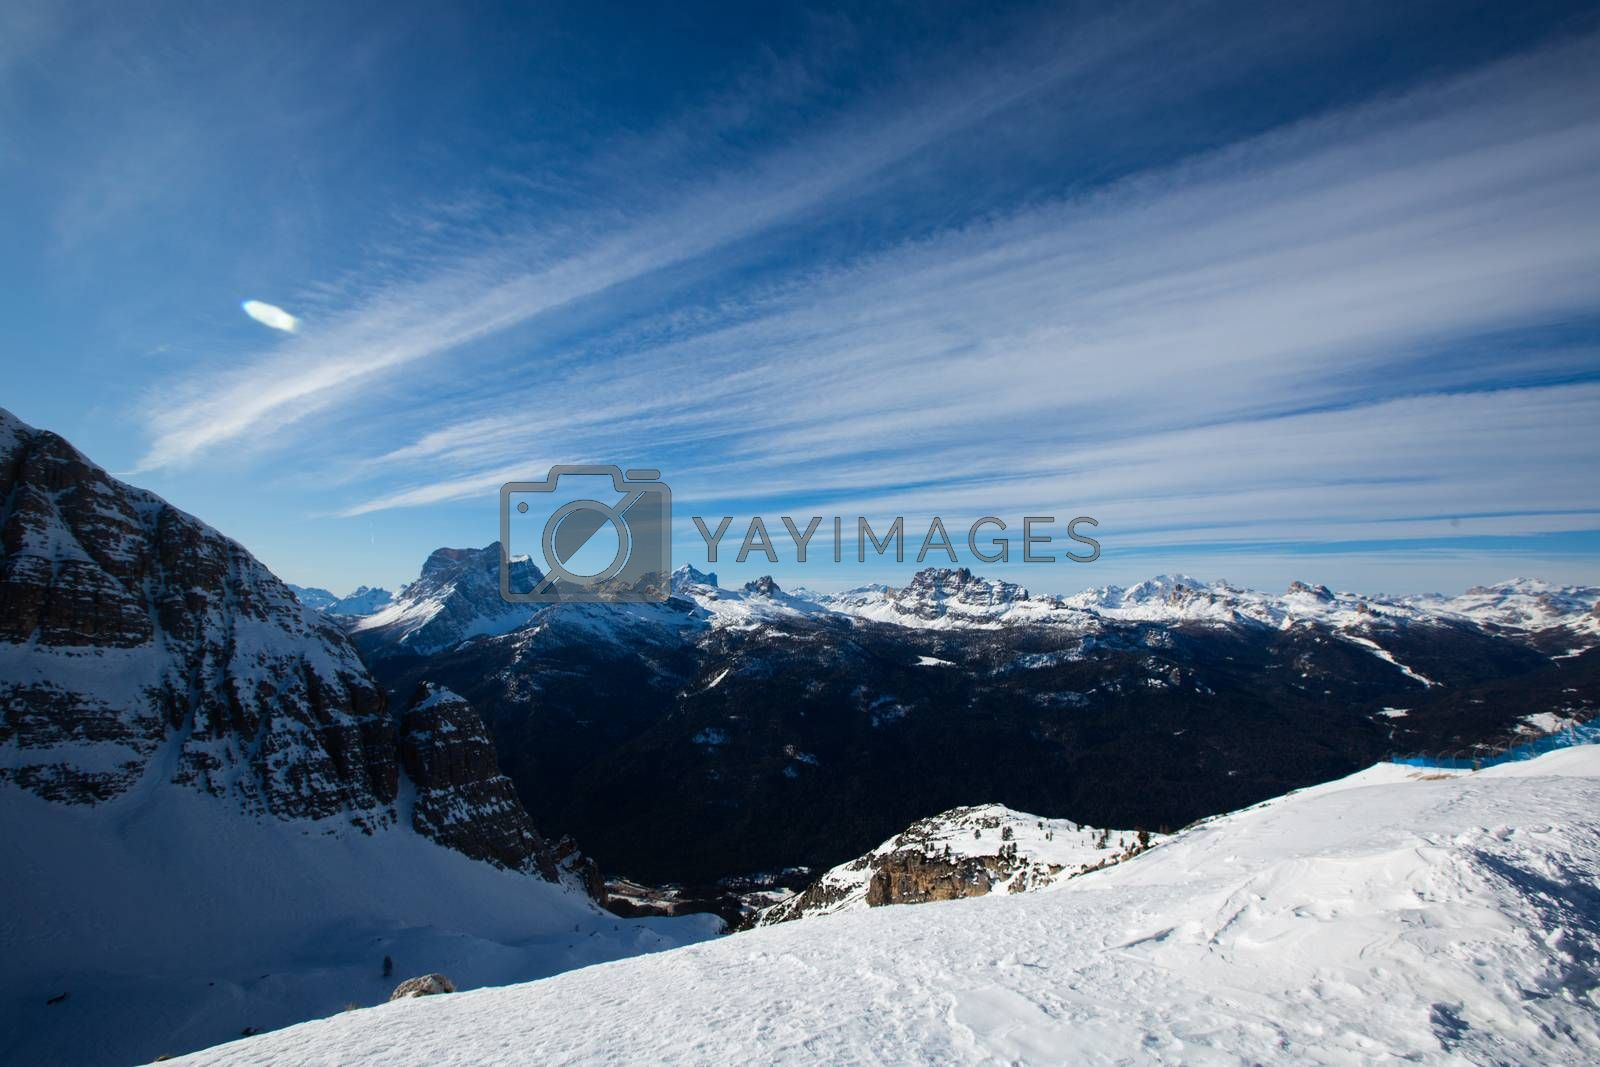 Dolomities Dolomiti Italy in wintertime beautiful alps winter mountains and ski slope Cortina d'Ampezzo Faloria skiing resort area